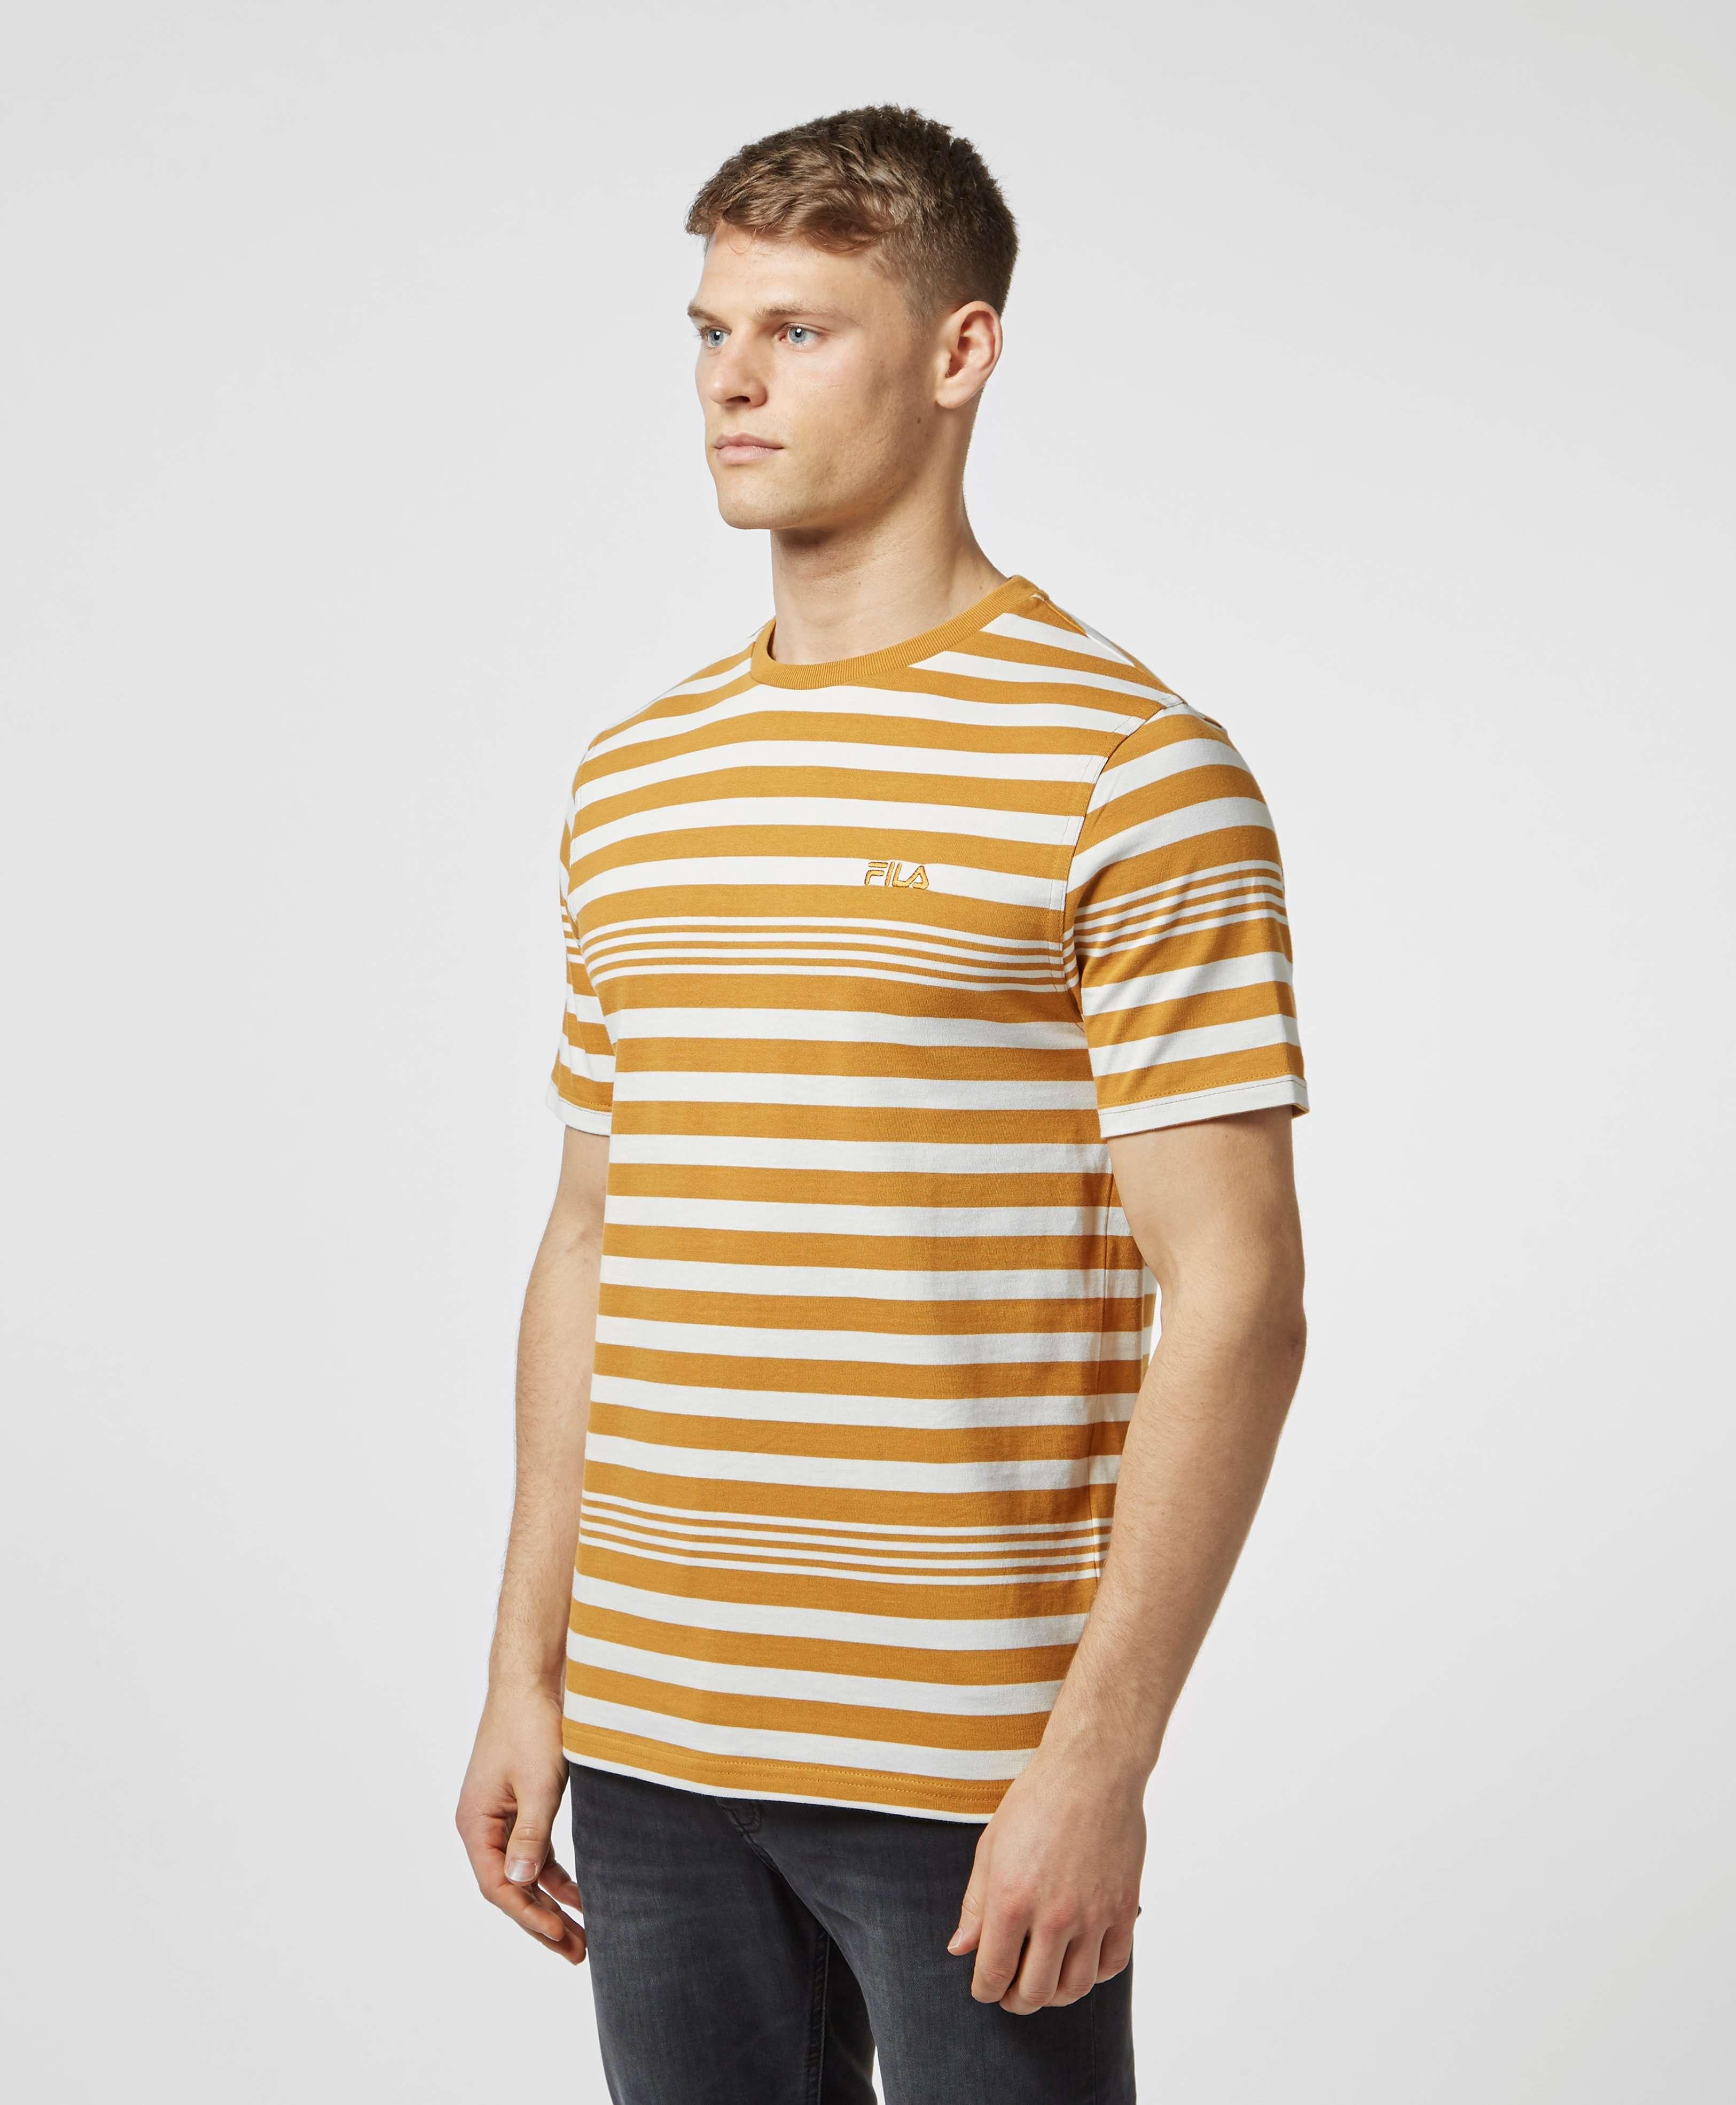 Fila Cometa Short Sleeve T-Shirt